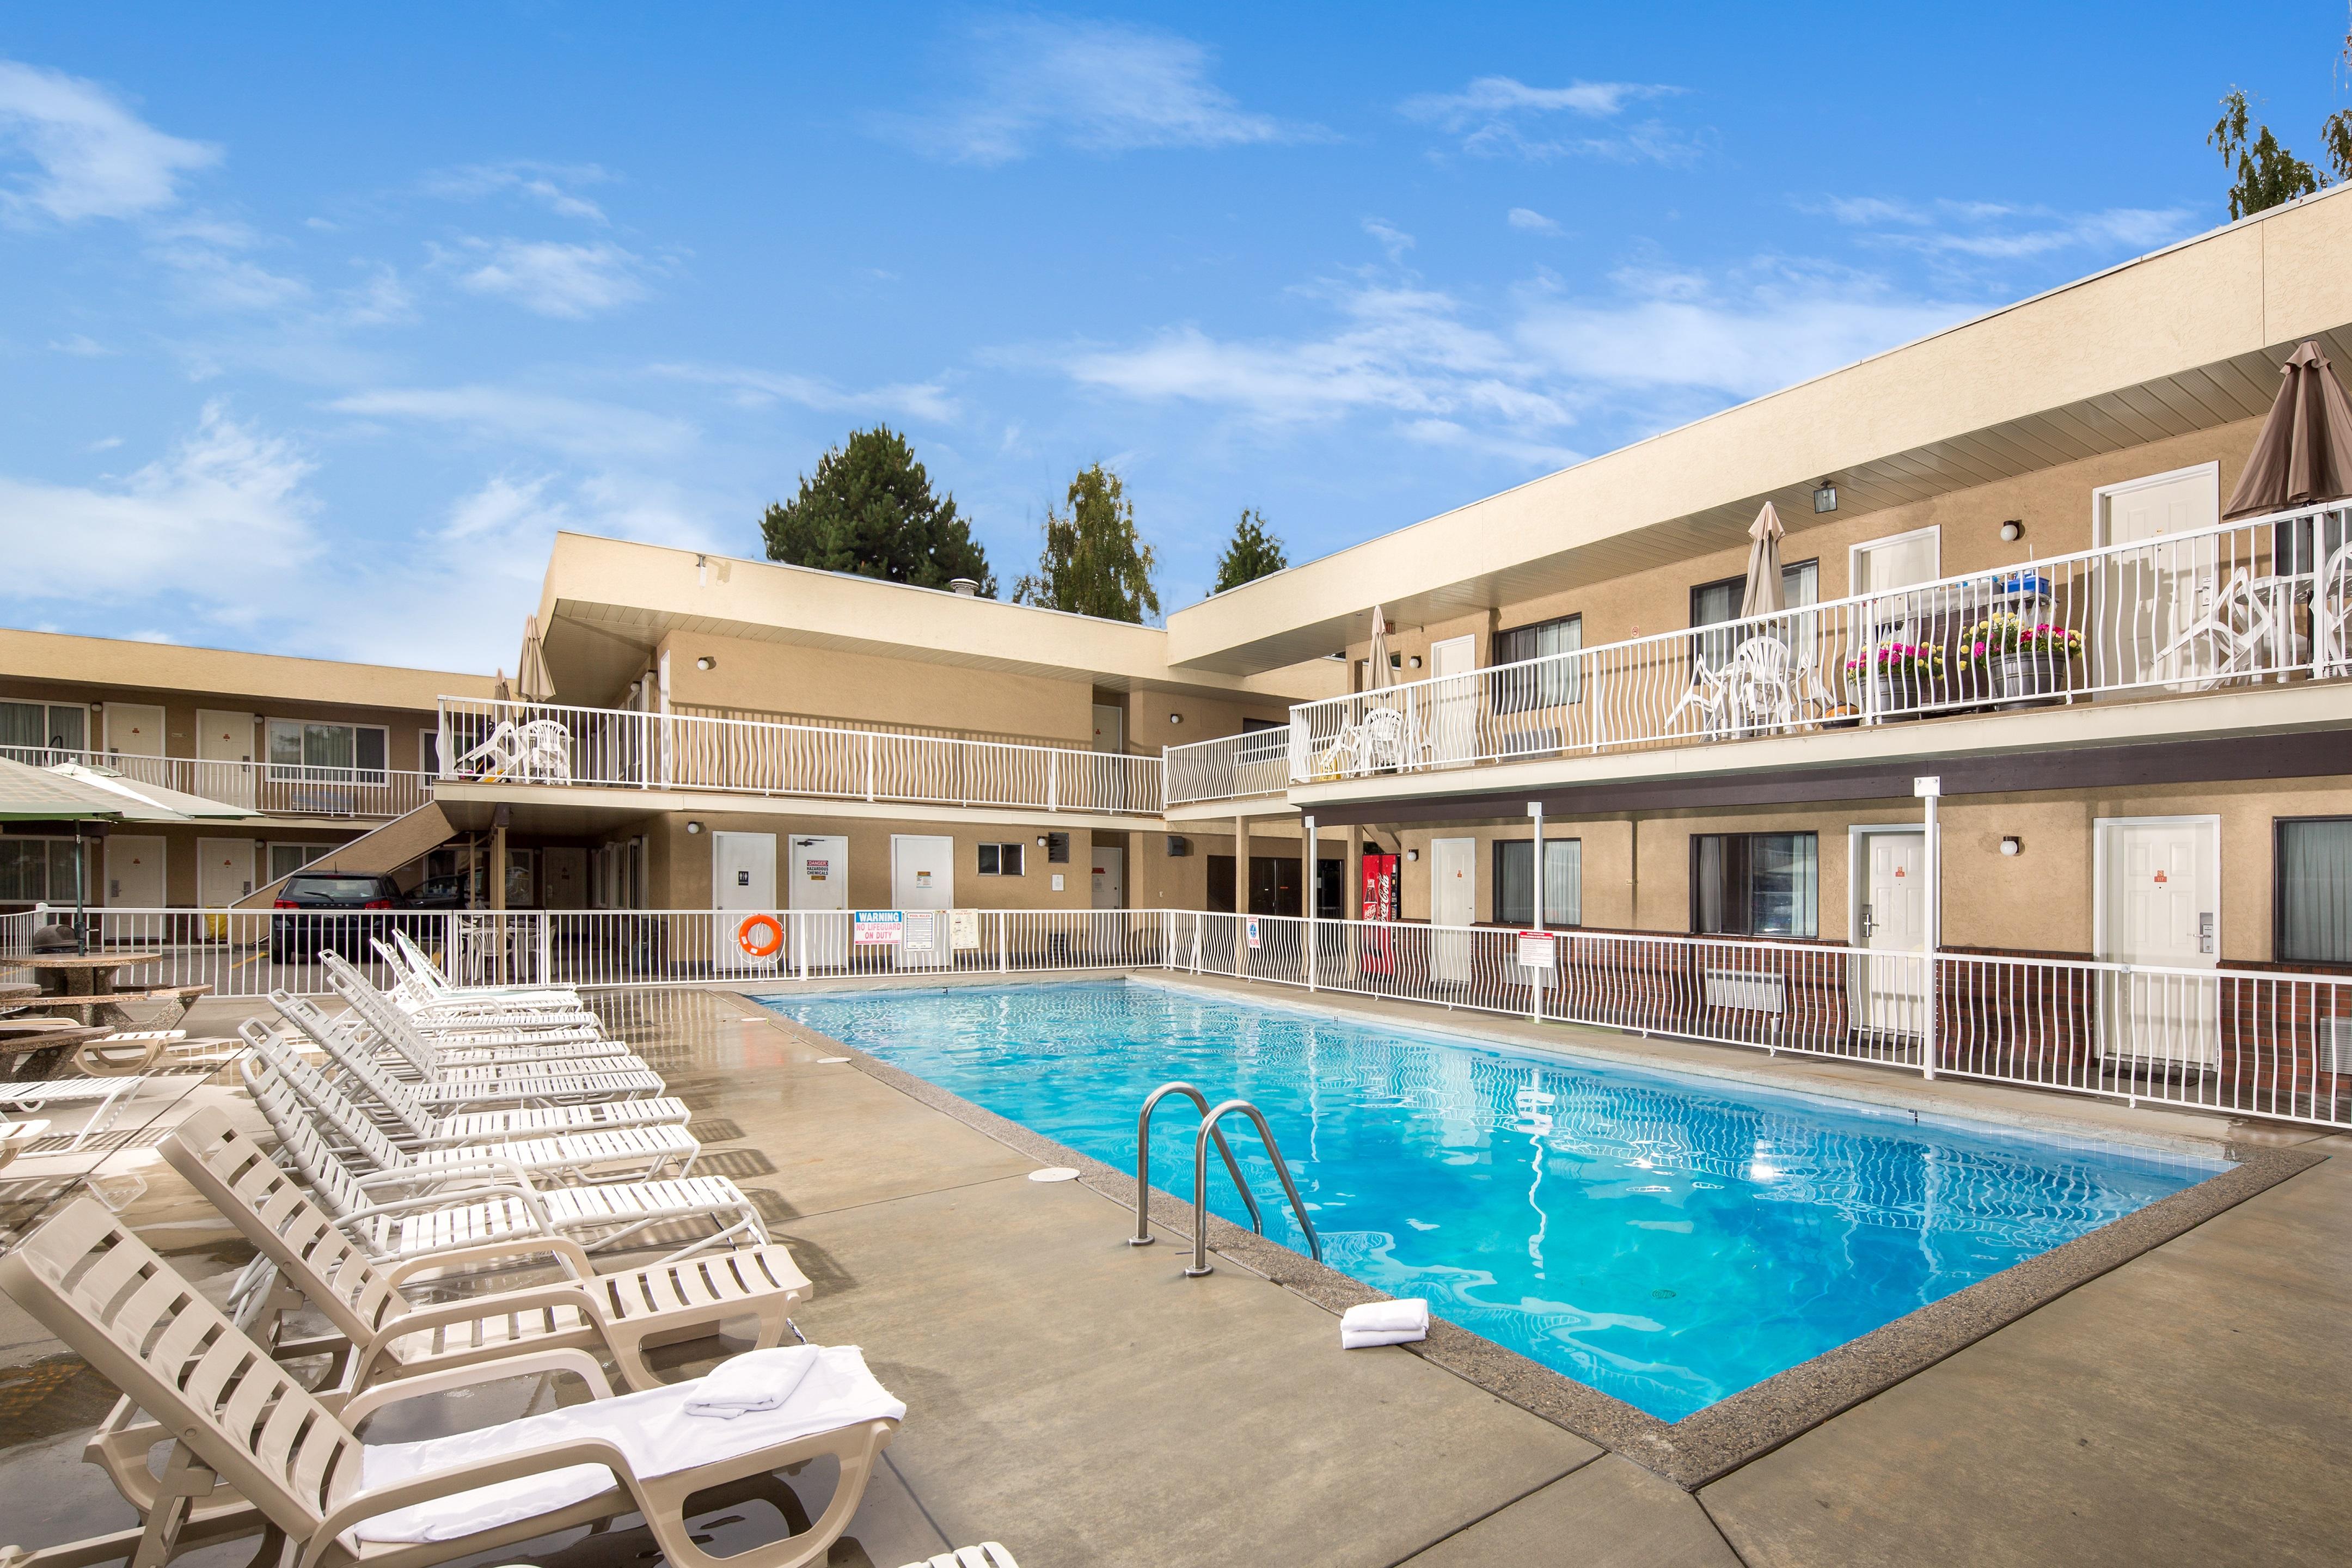 Siesta Suites Kelowna Hotel Accommodations Family Vacation Bc